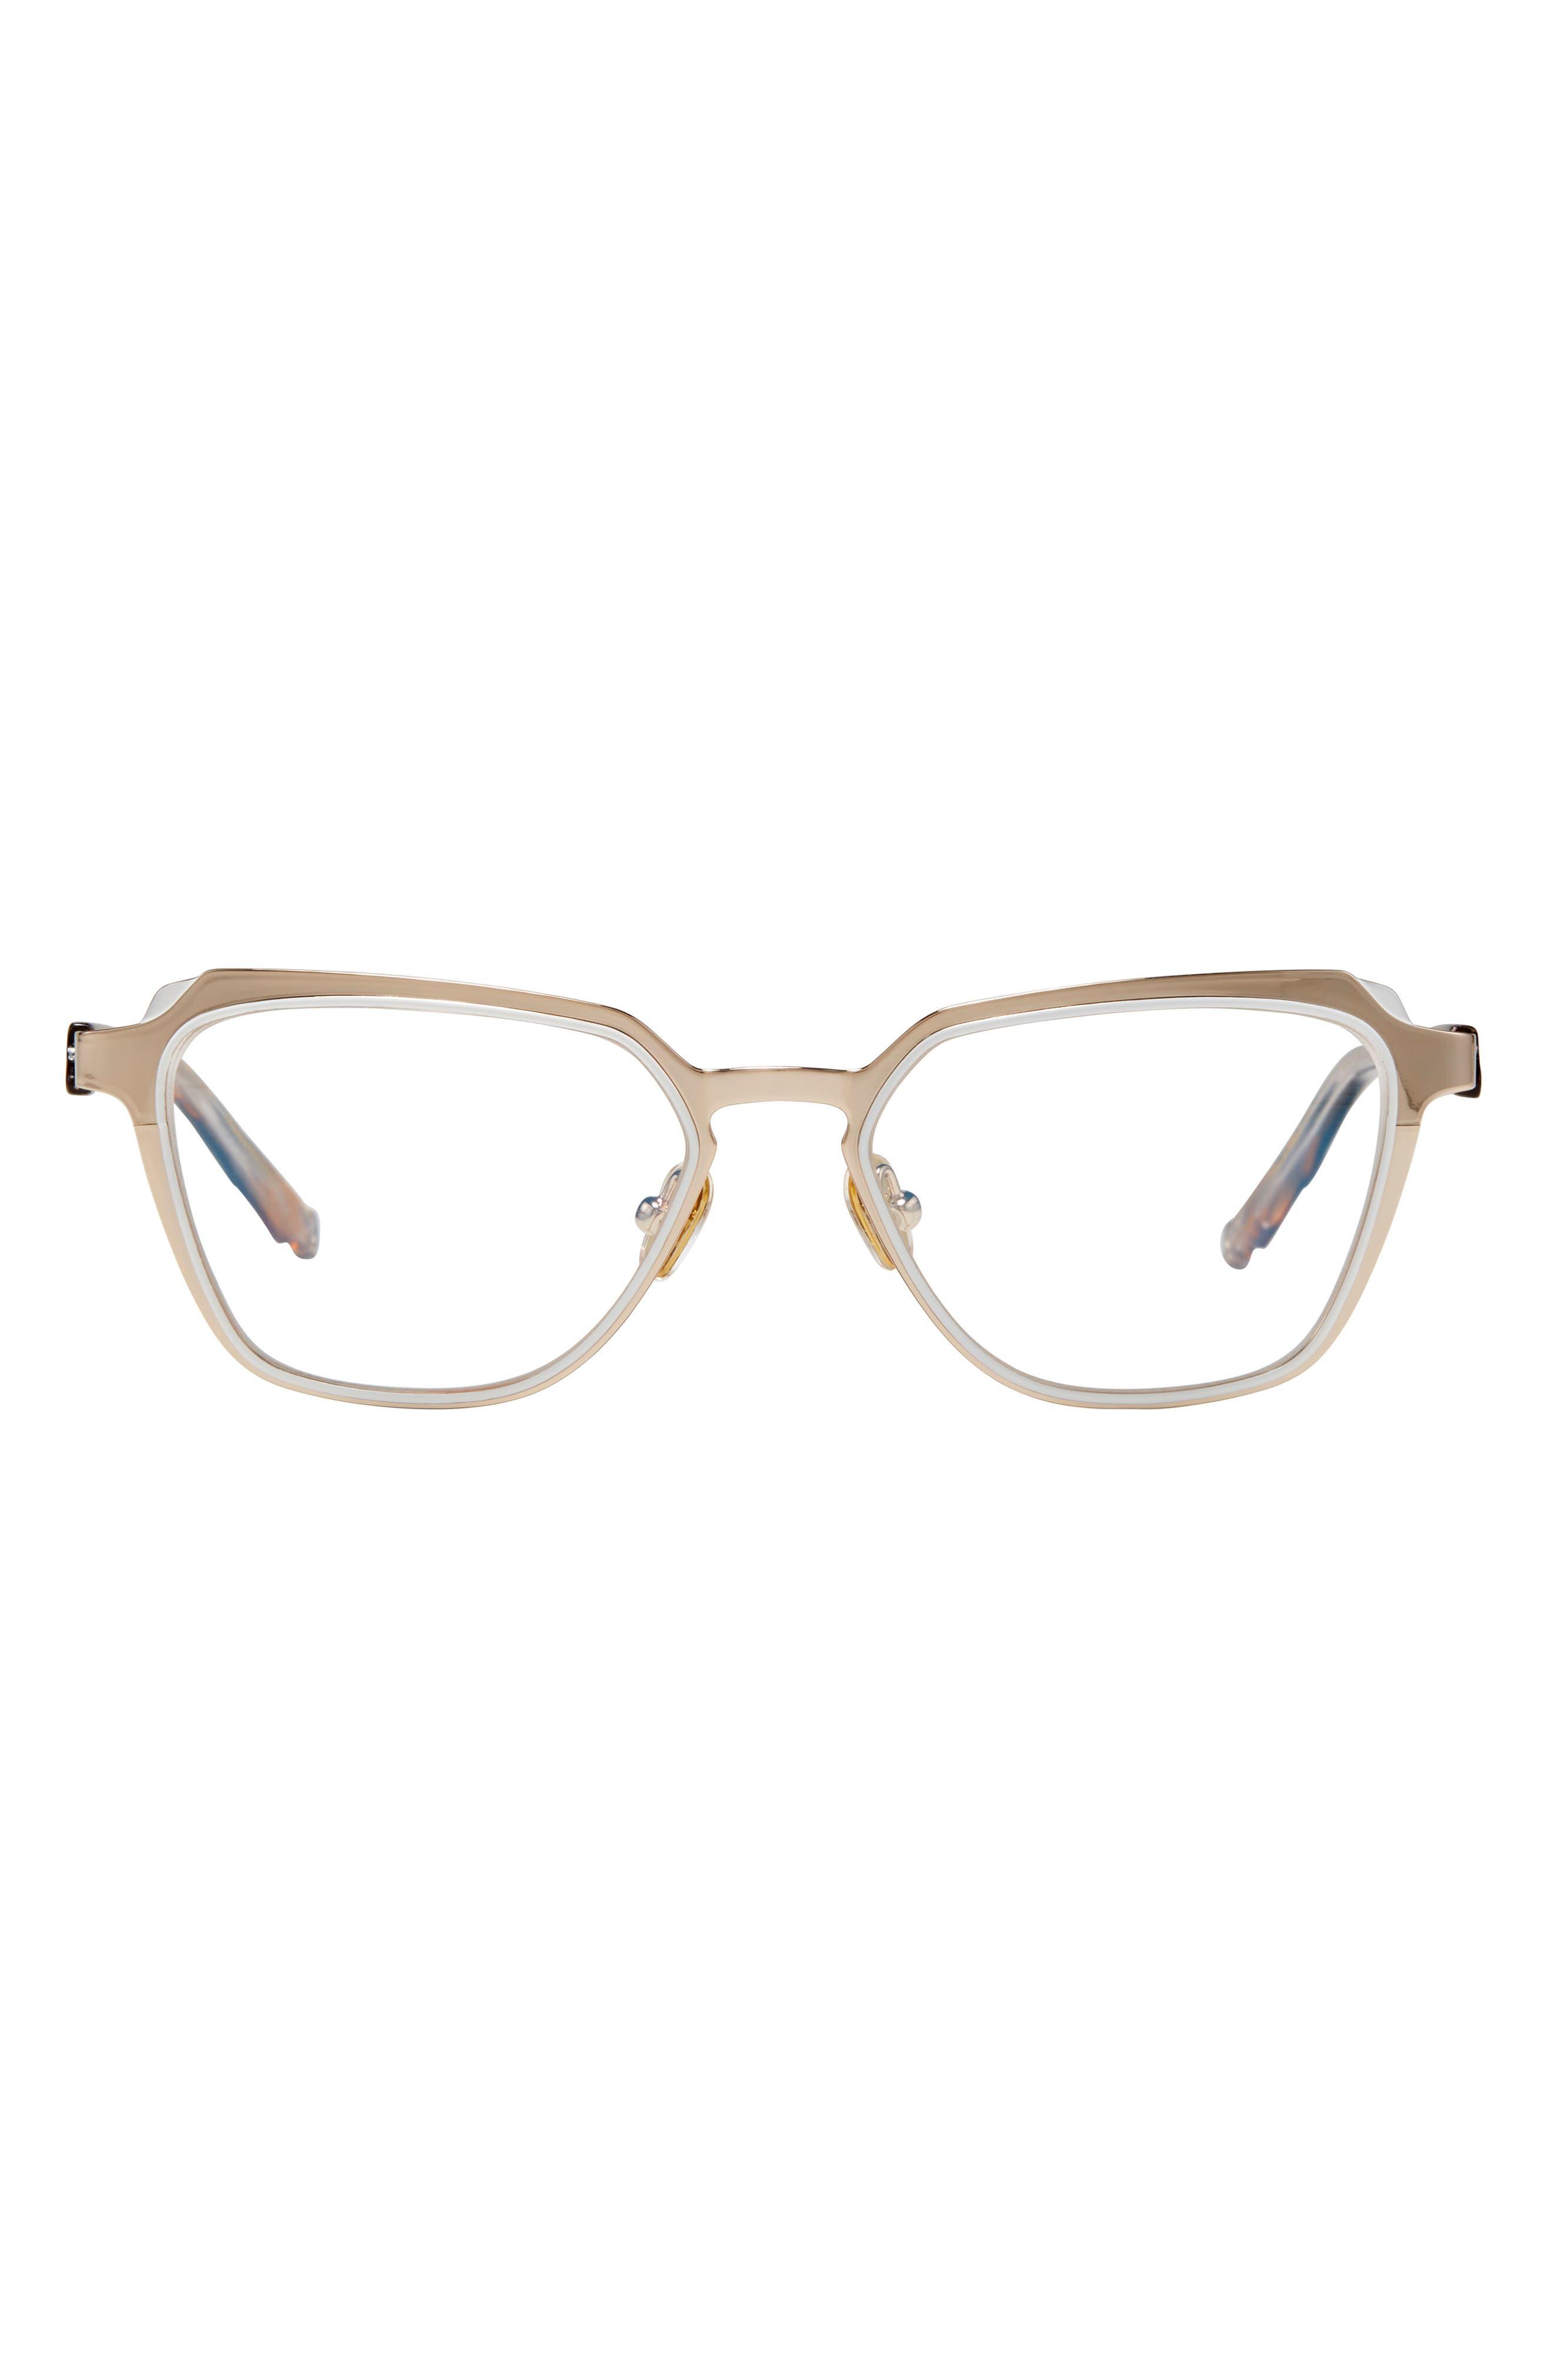 Elevated Pentagon 53mm Blue Light Blocking Glasses